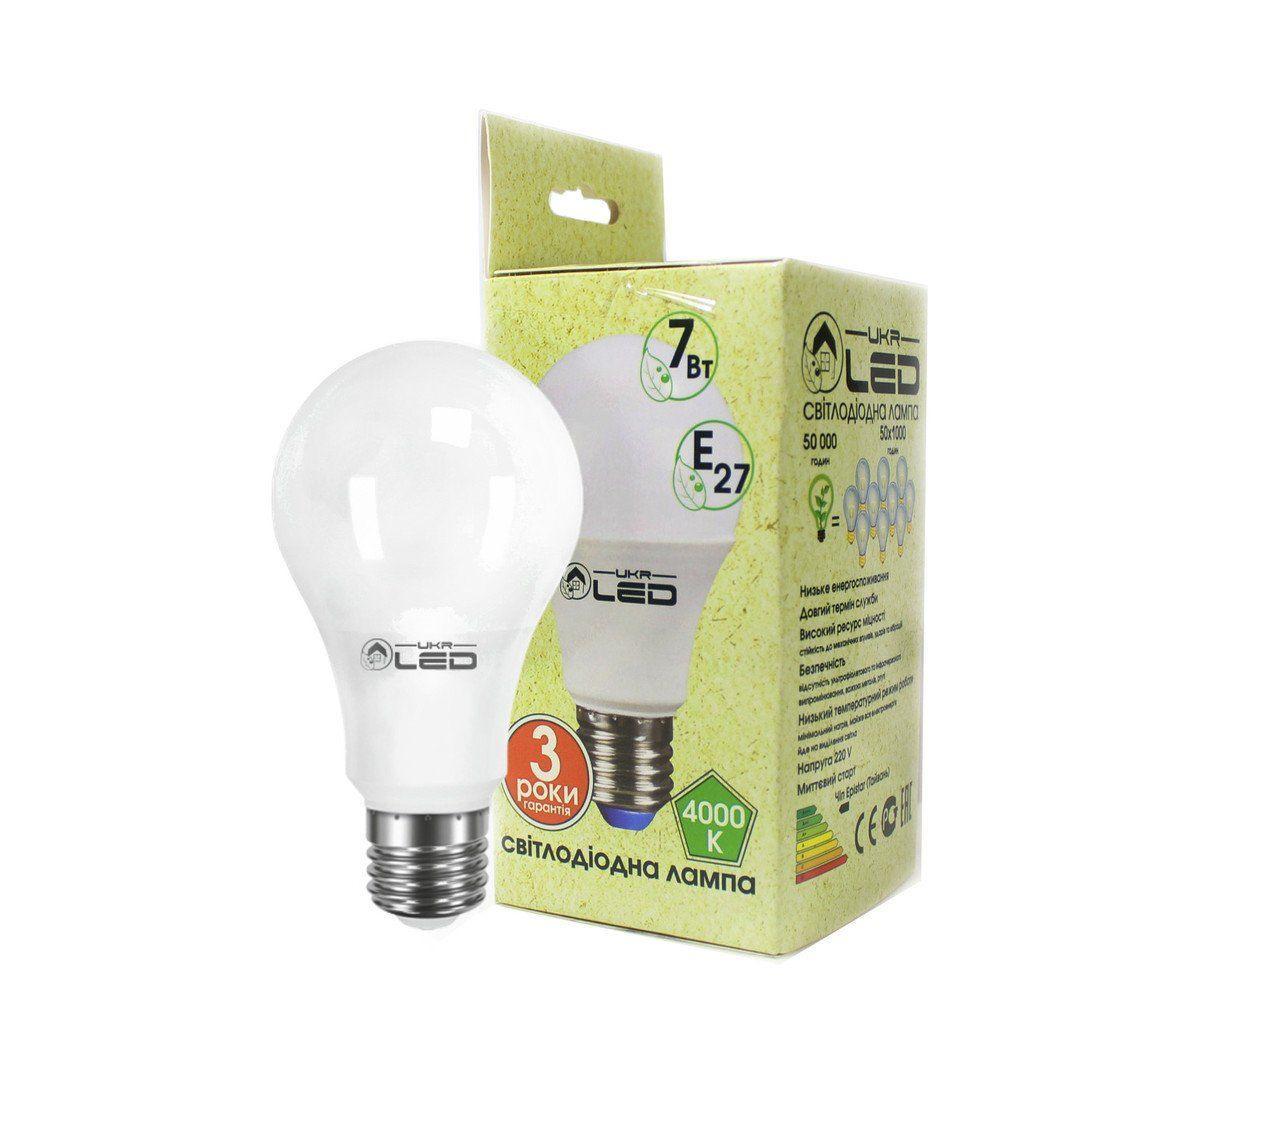 Светодиодная лампа UkrLed Е27 7W (Груша) 4000К (172)